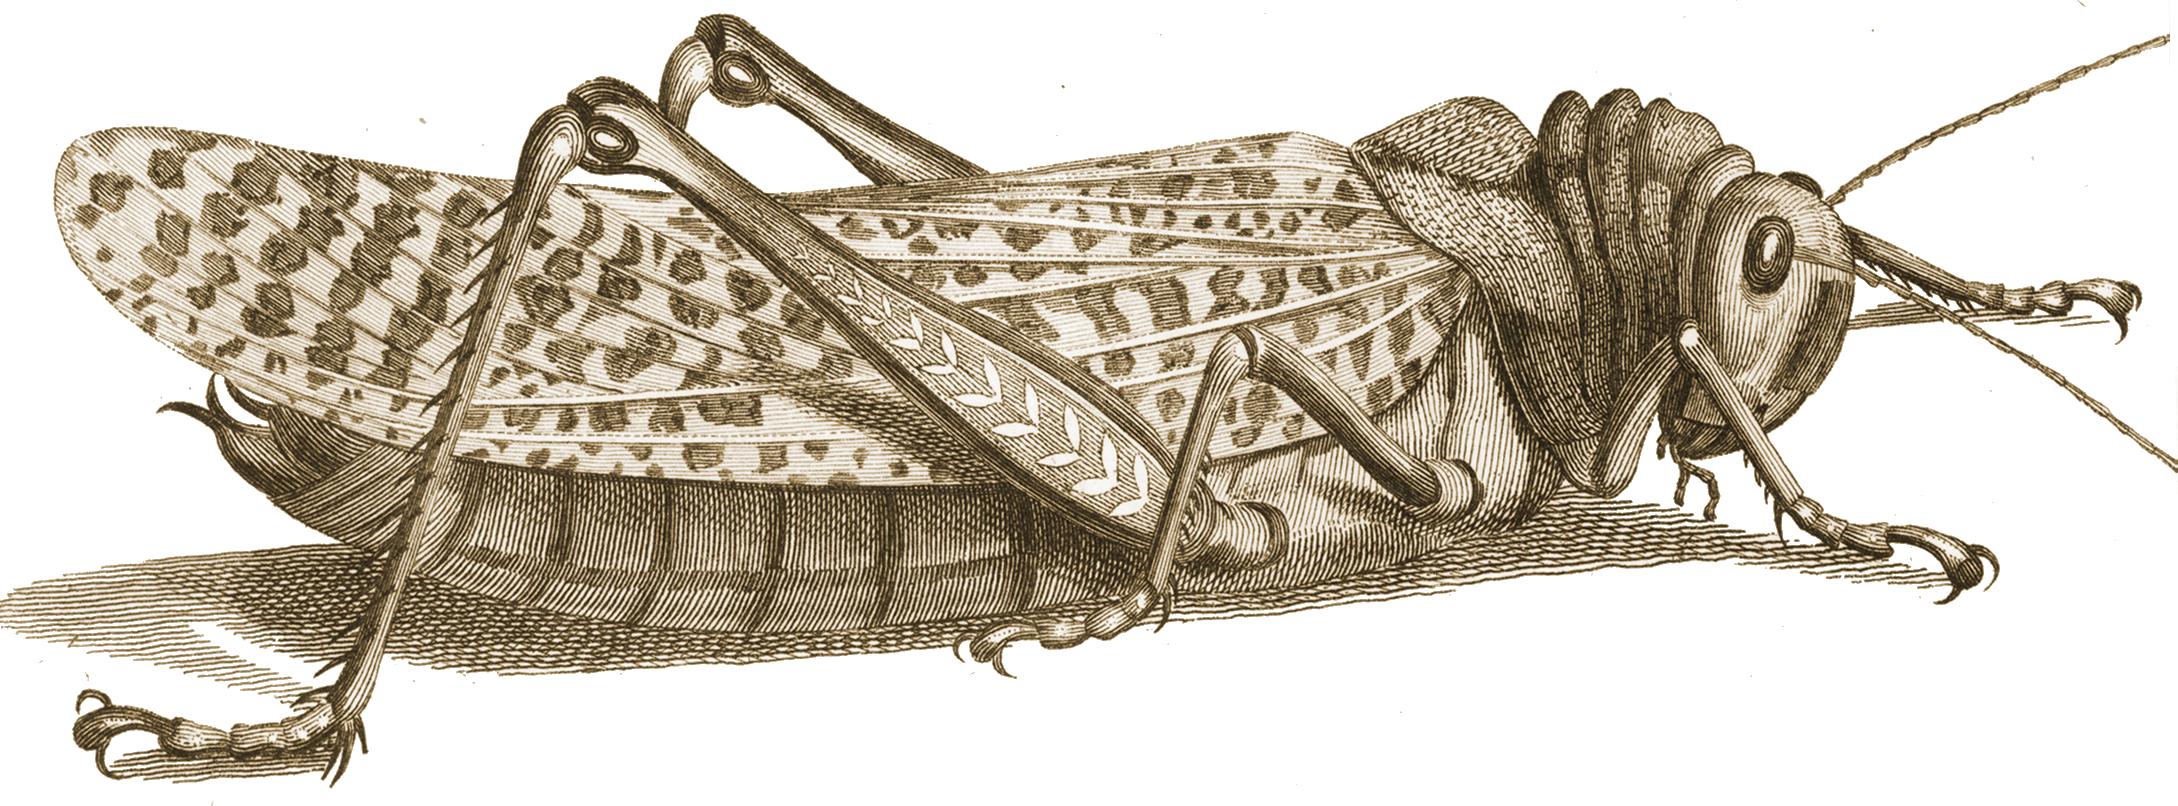 PNG Locust-PlusPNG.com-2178 - PNG Locust